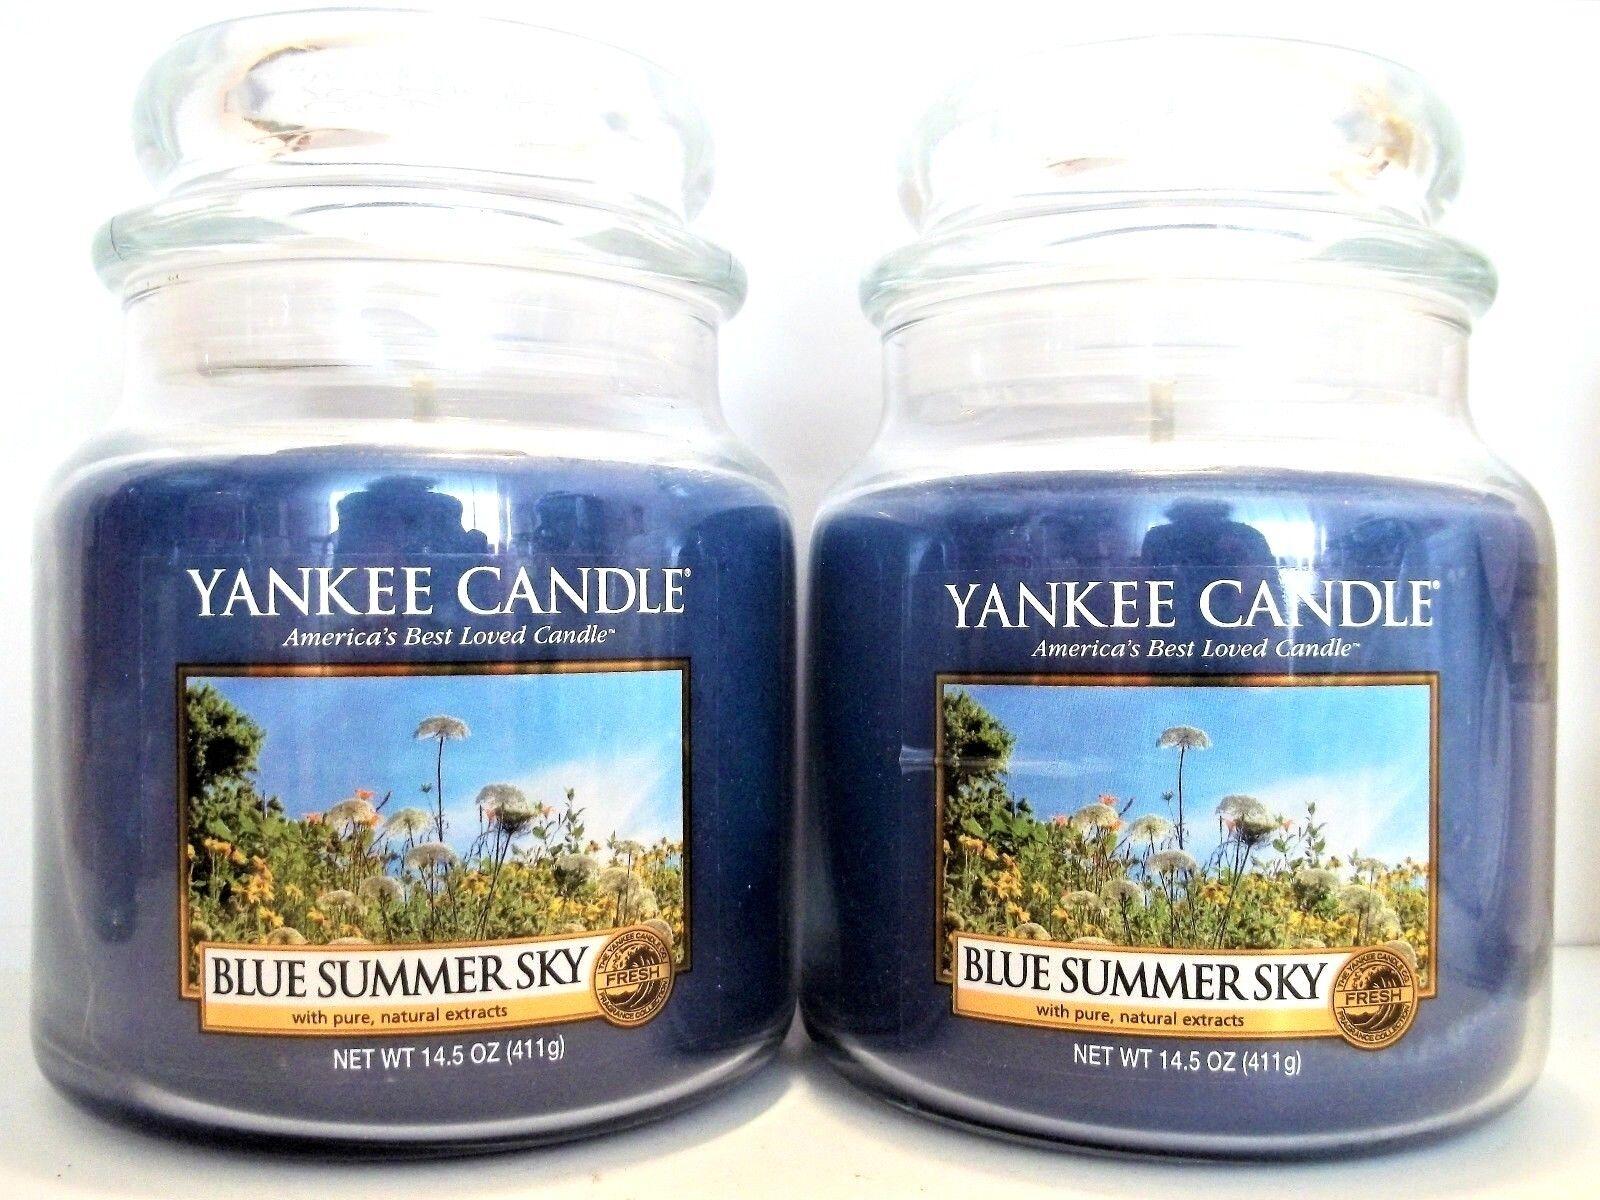 YANKEE Candle blueE SUMMER SKY Jar Candles, 14.5 oz 411 g, NEW x 2